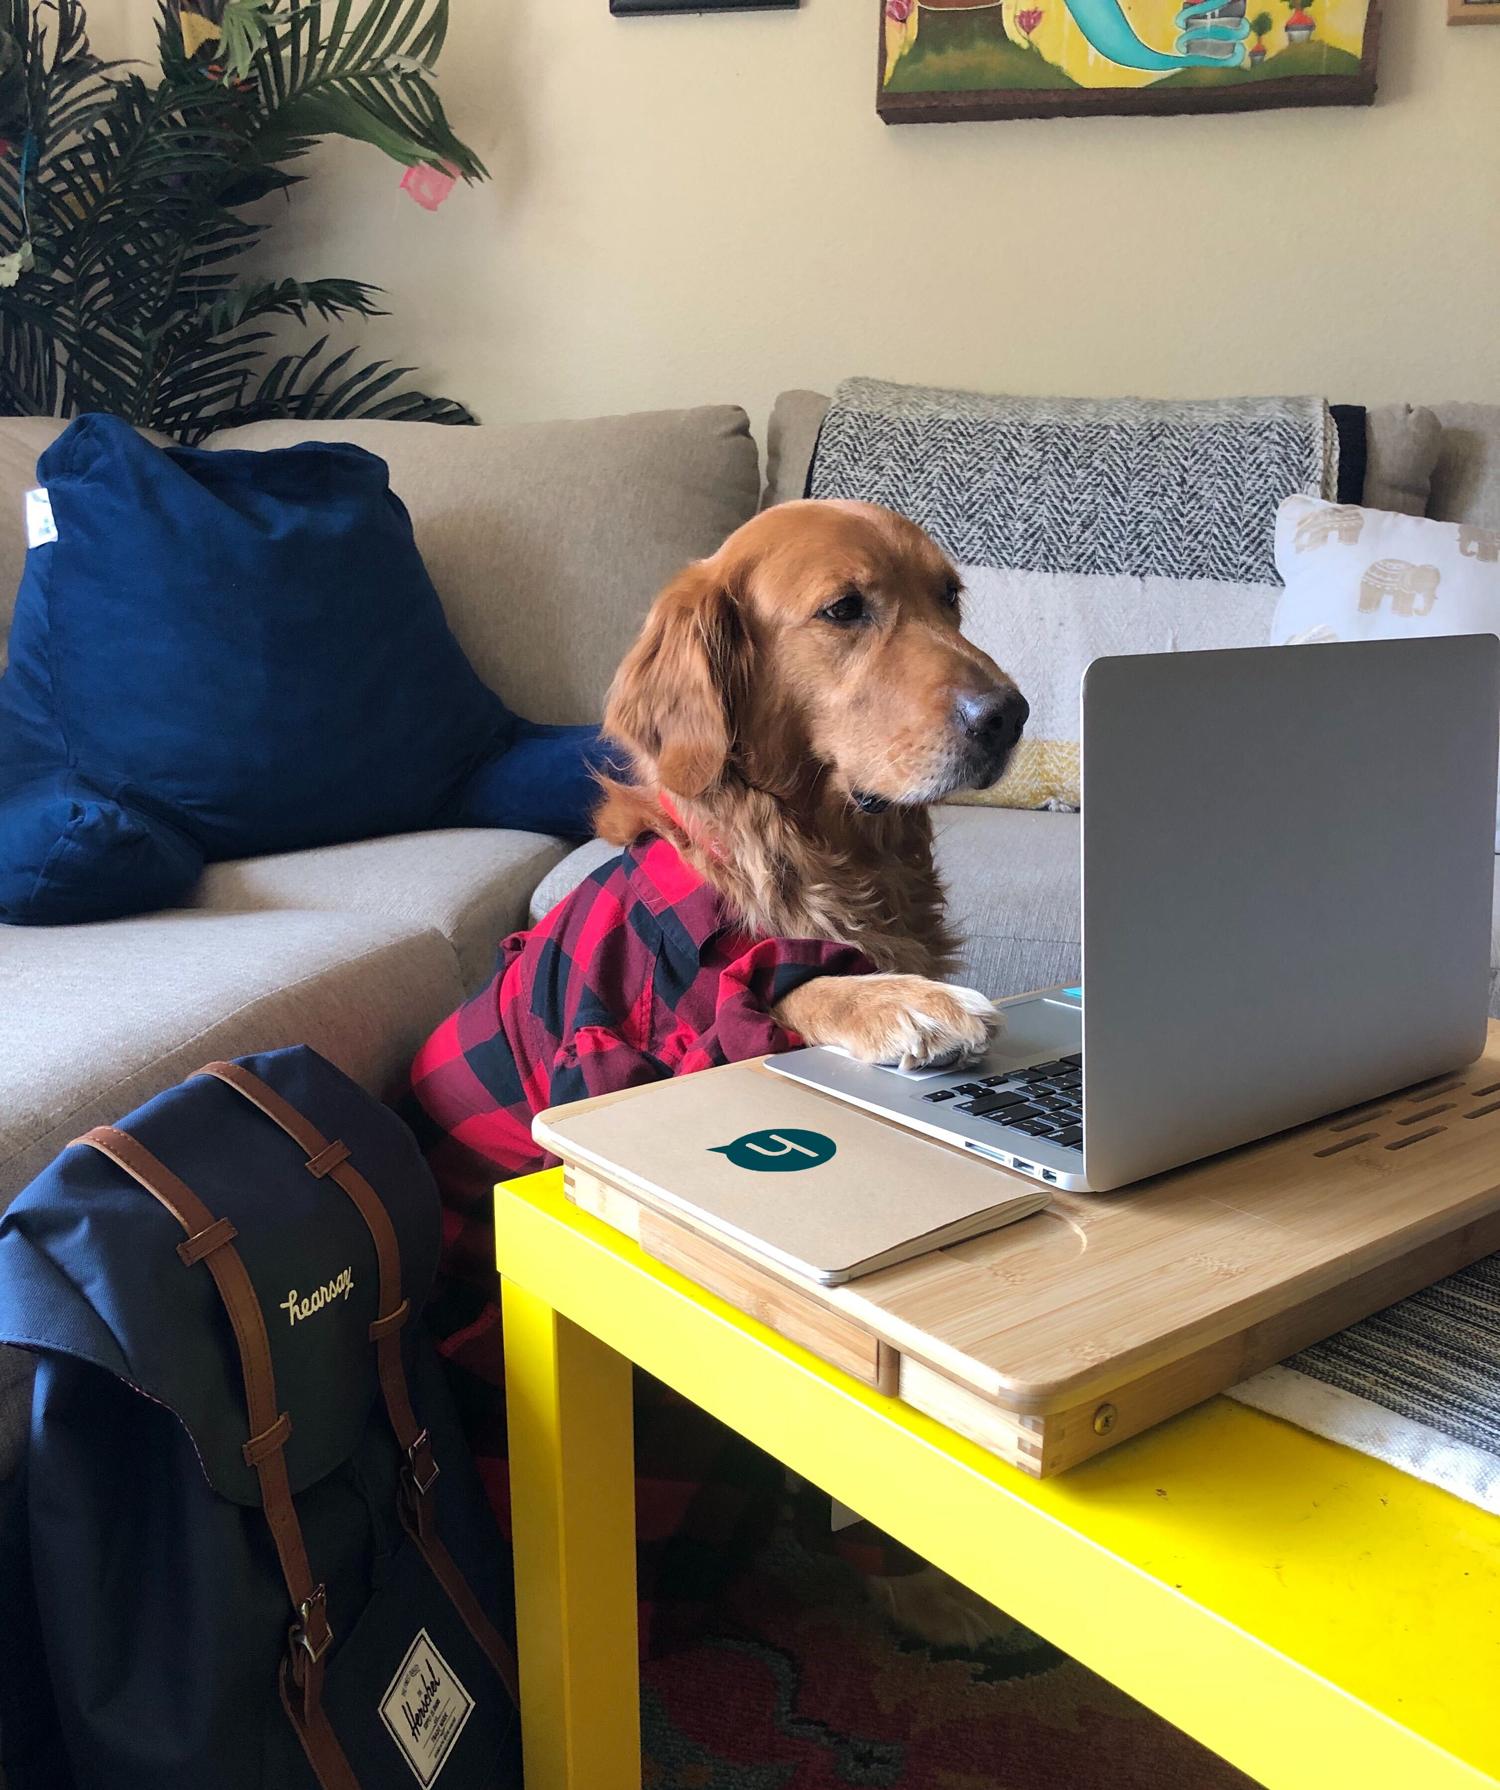 Employee dog at computer